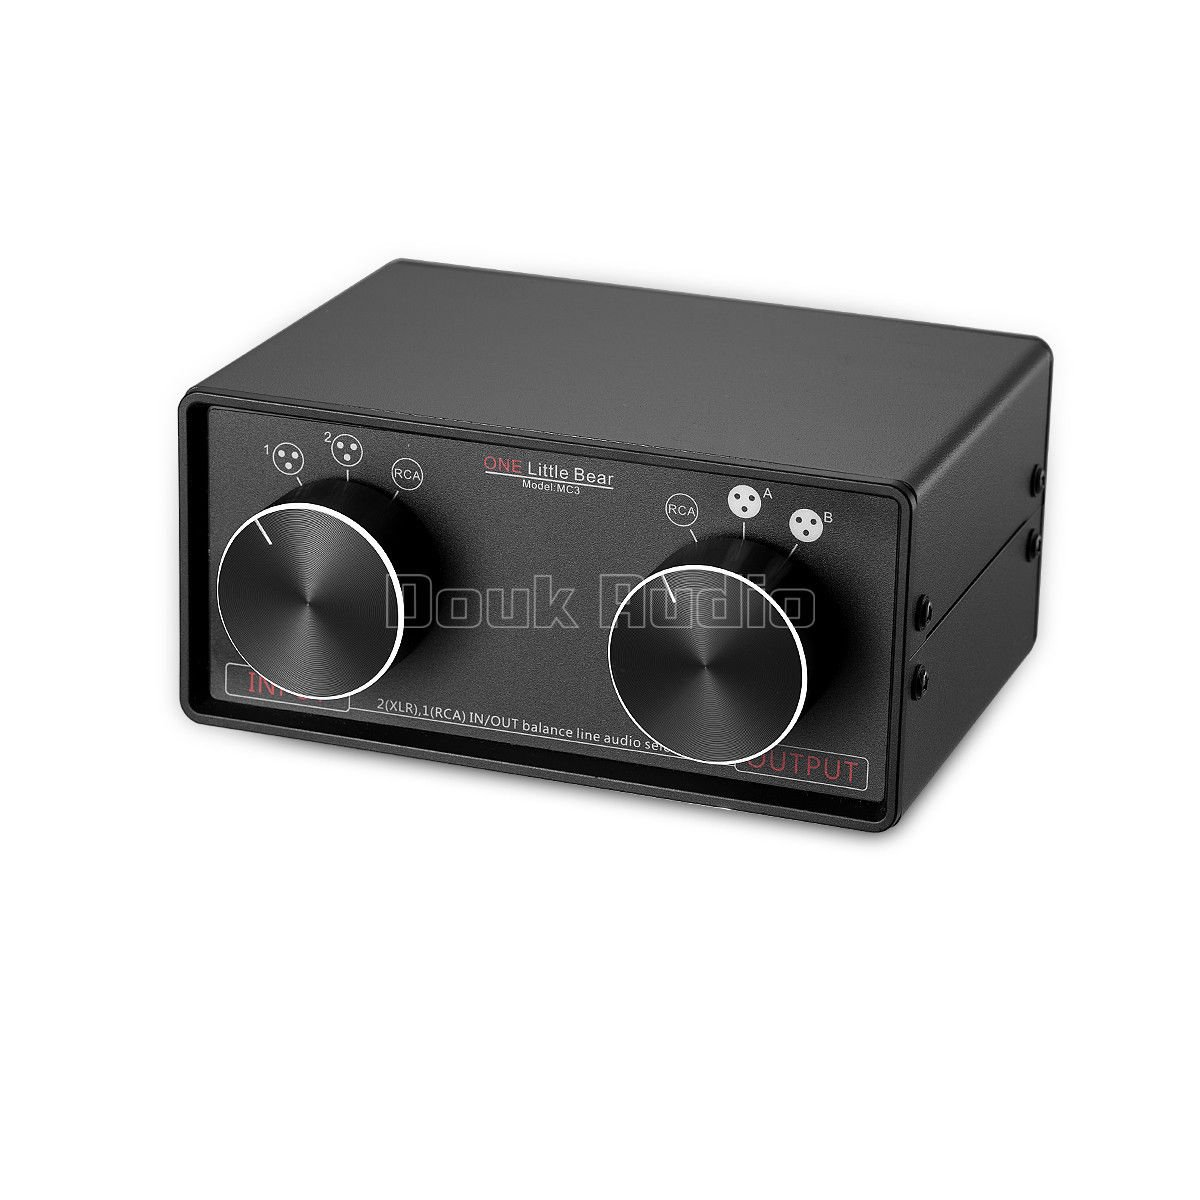 Nobsound Little Bear MC3 3-IN-3-OUT XLR Balanced/RCA Stereo Converter Audio Selector Splitter Box Passive Preamp XLR to RCA Audio Switch (XLR & RCA)